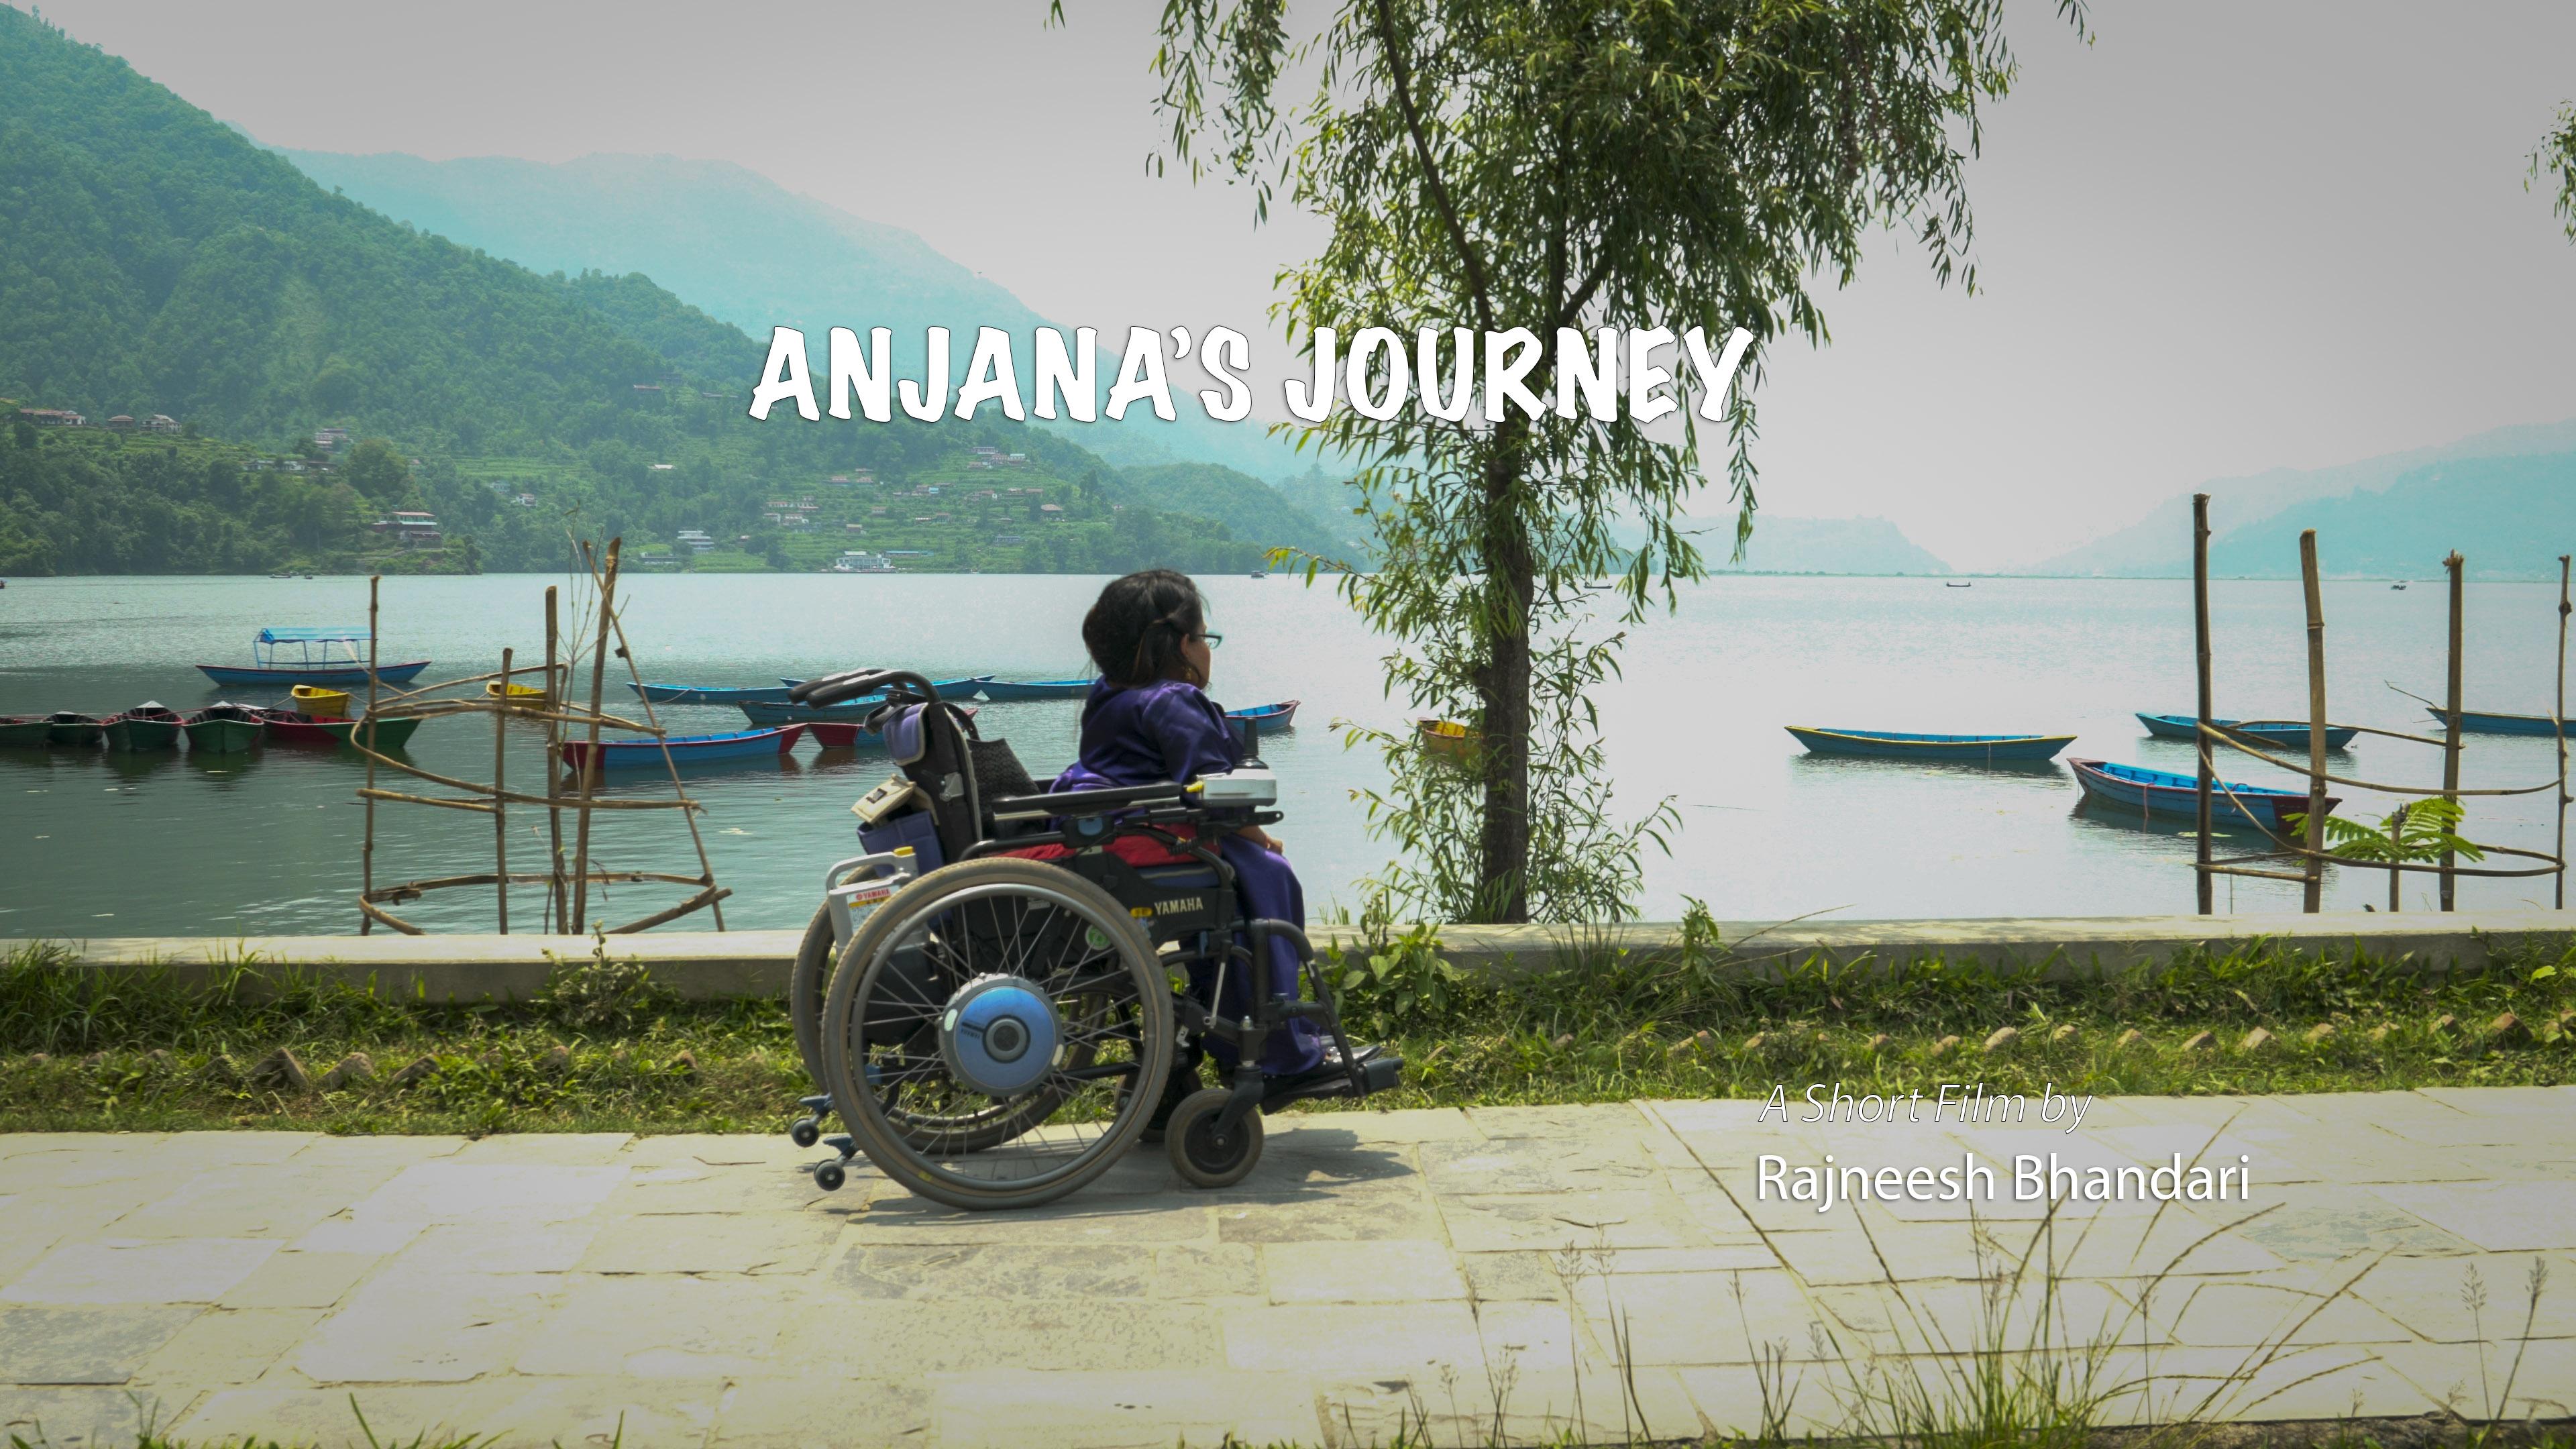 'Anjana's Journey' finalist of 2018's Ability Short Film Awards